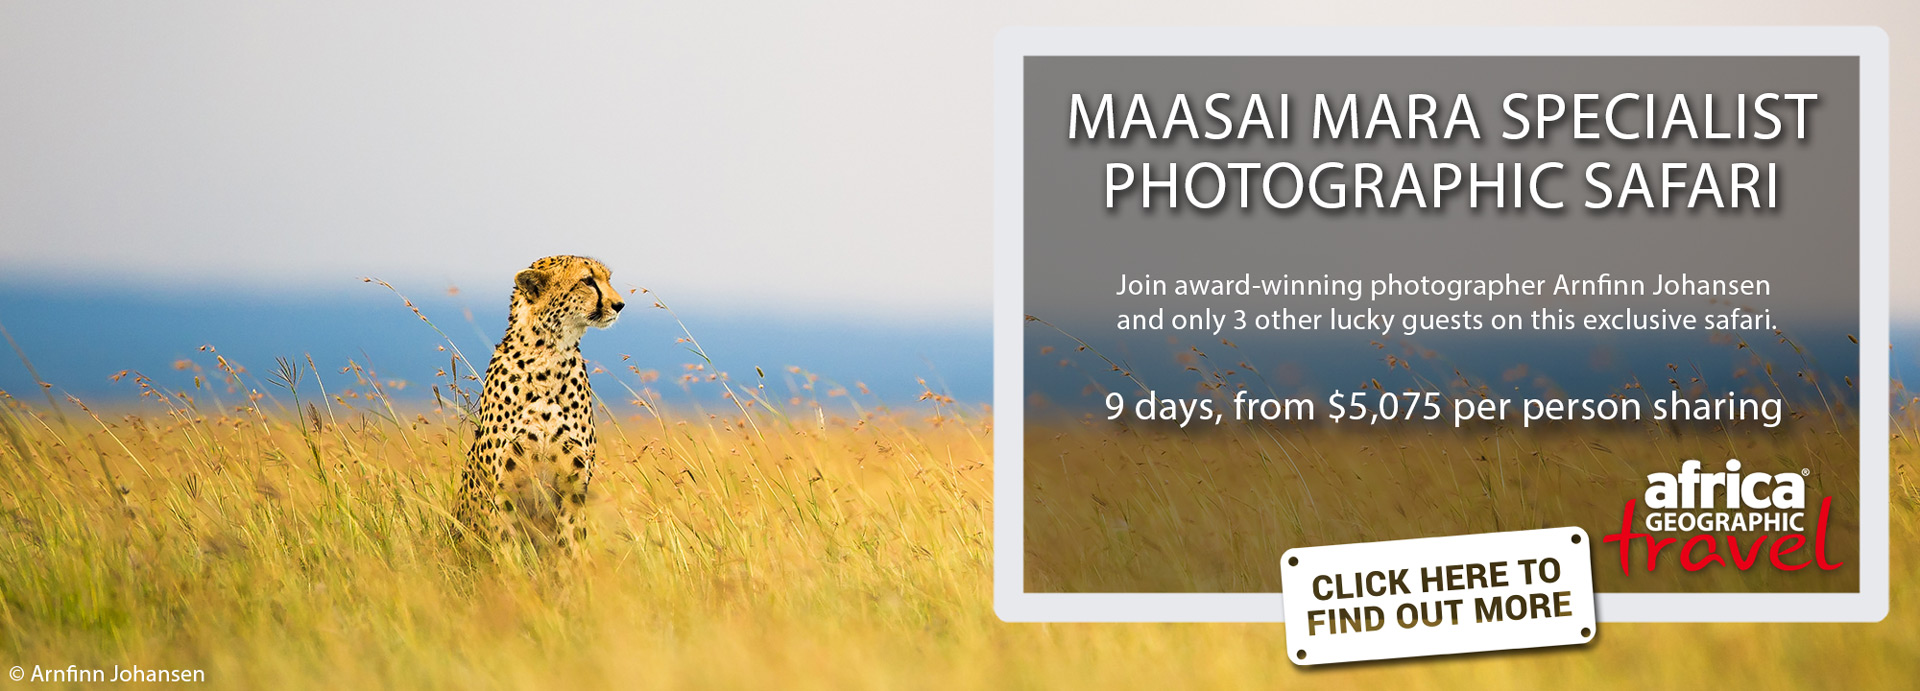 Maasai Mara Specialist Photographic Safari